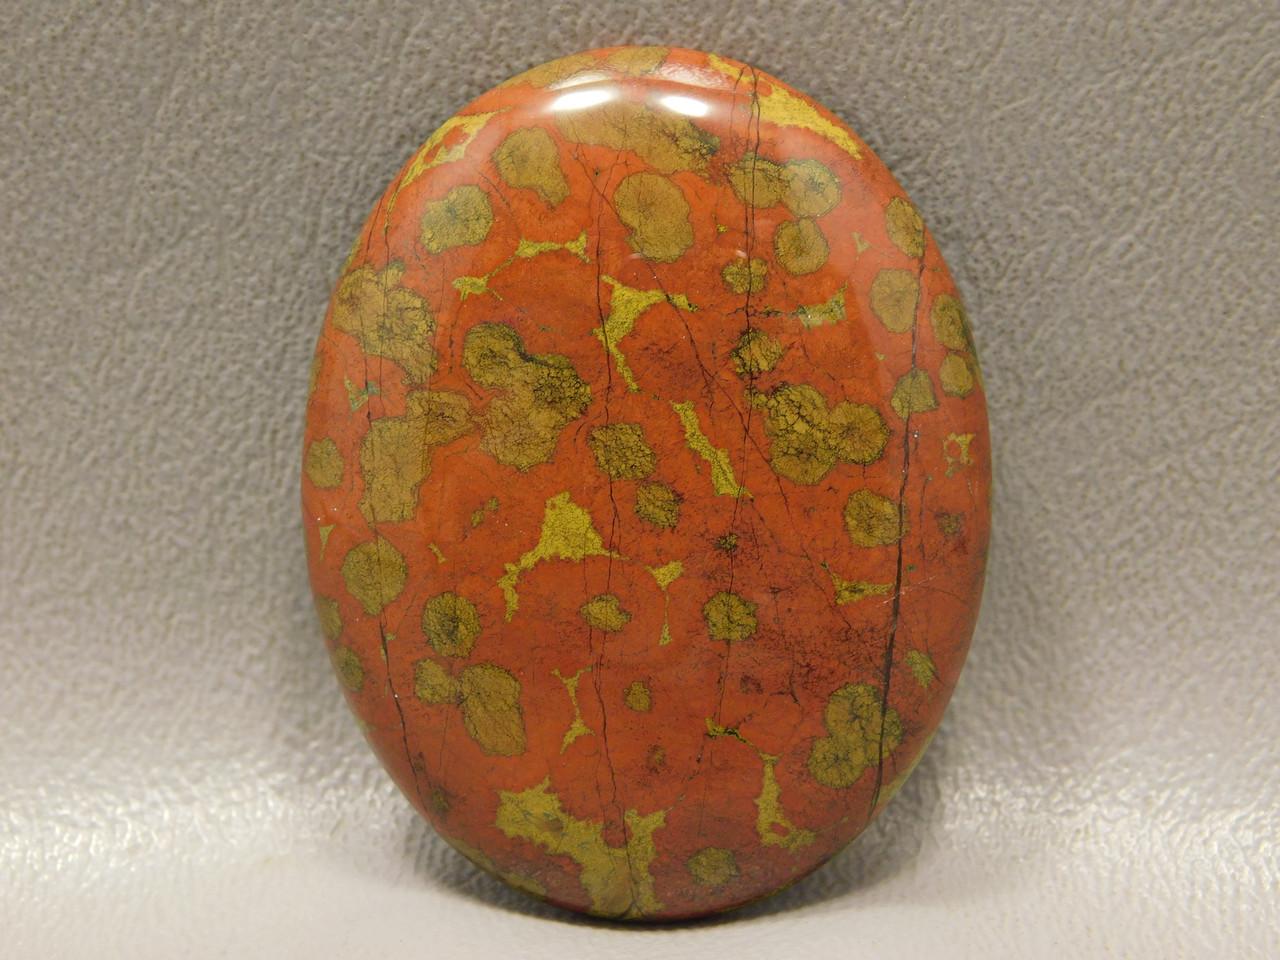 Orbicular Morgan Hill Poppy Jasper Jewelry Cabochon Stone #10